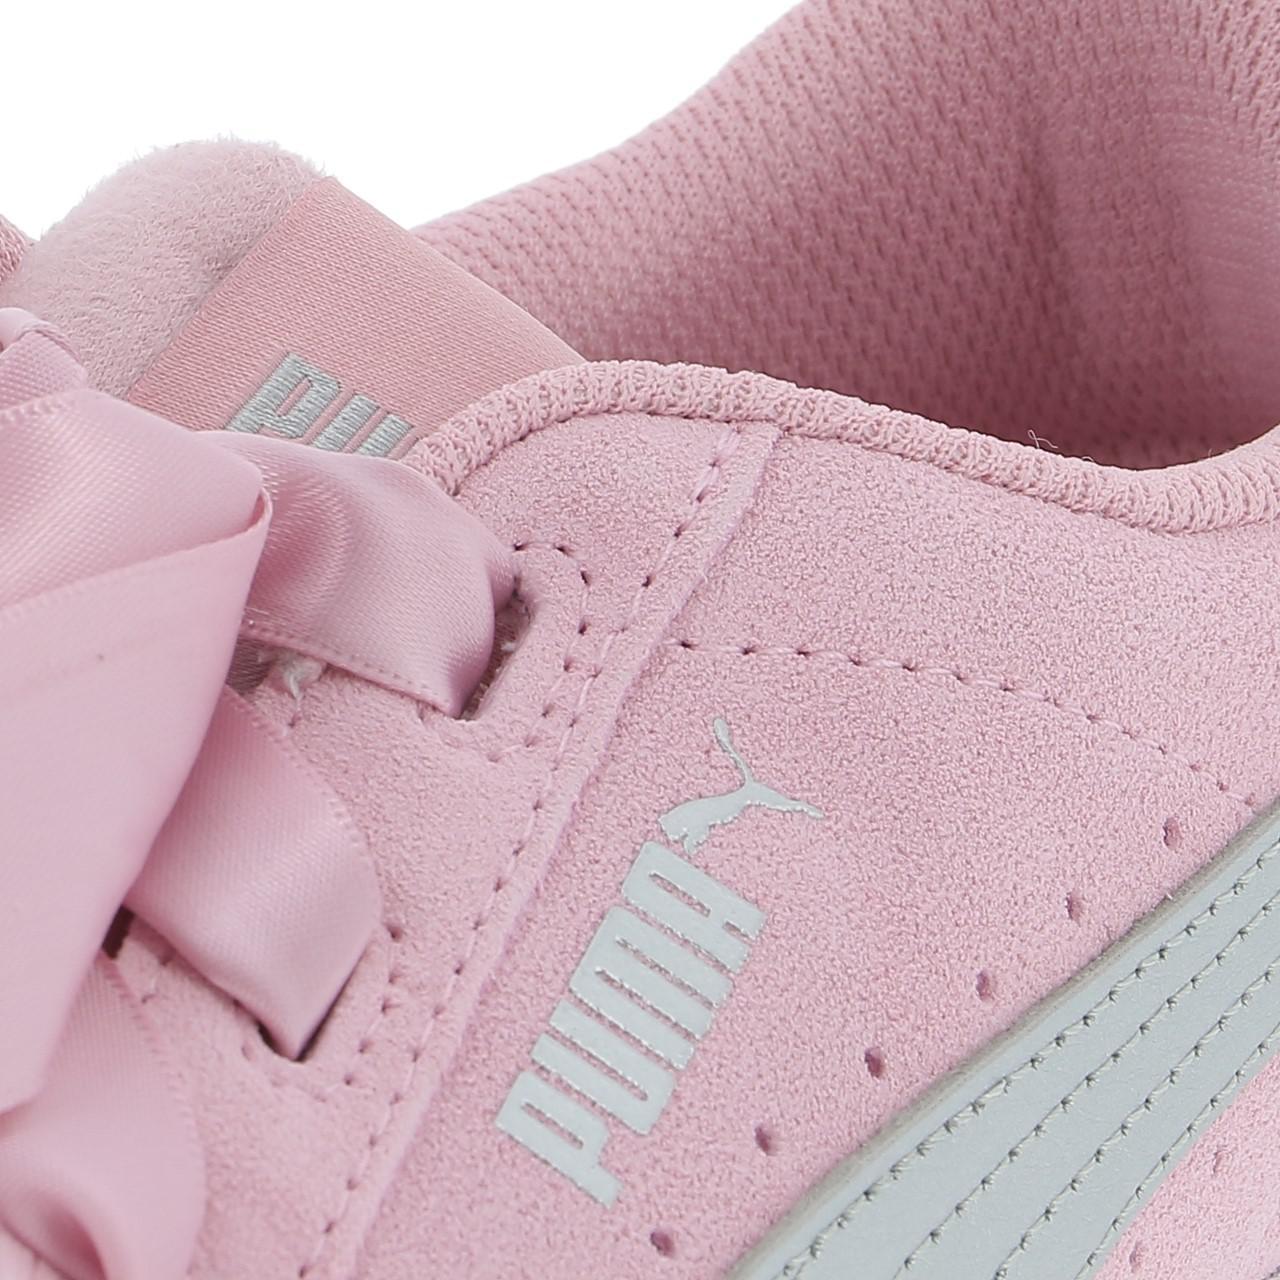 Schuhe-Niedrig-Leder-oder-Faux-Puma-Vikky-Band-Rosa-Maedchen-Rosa-17056-Neu Indexbild 2